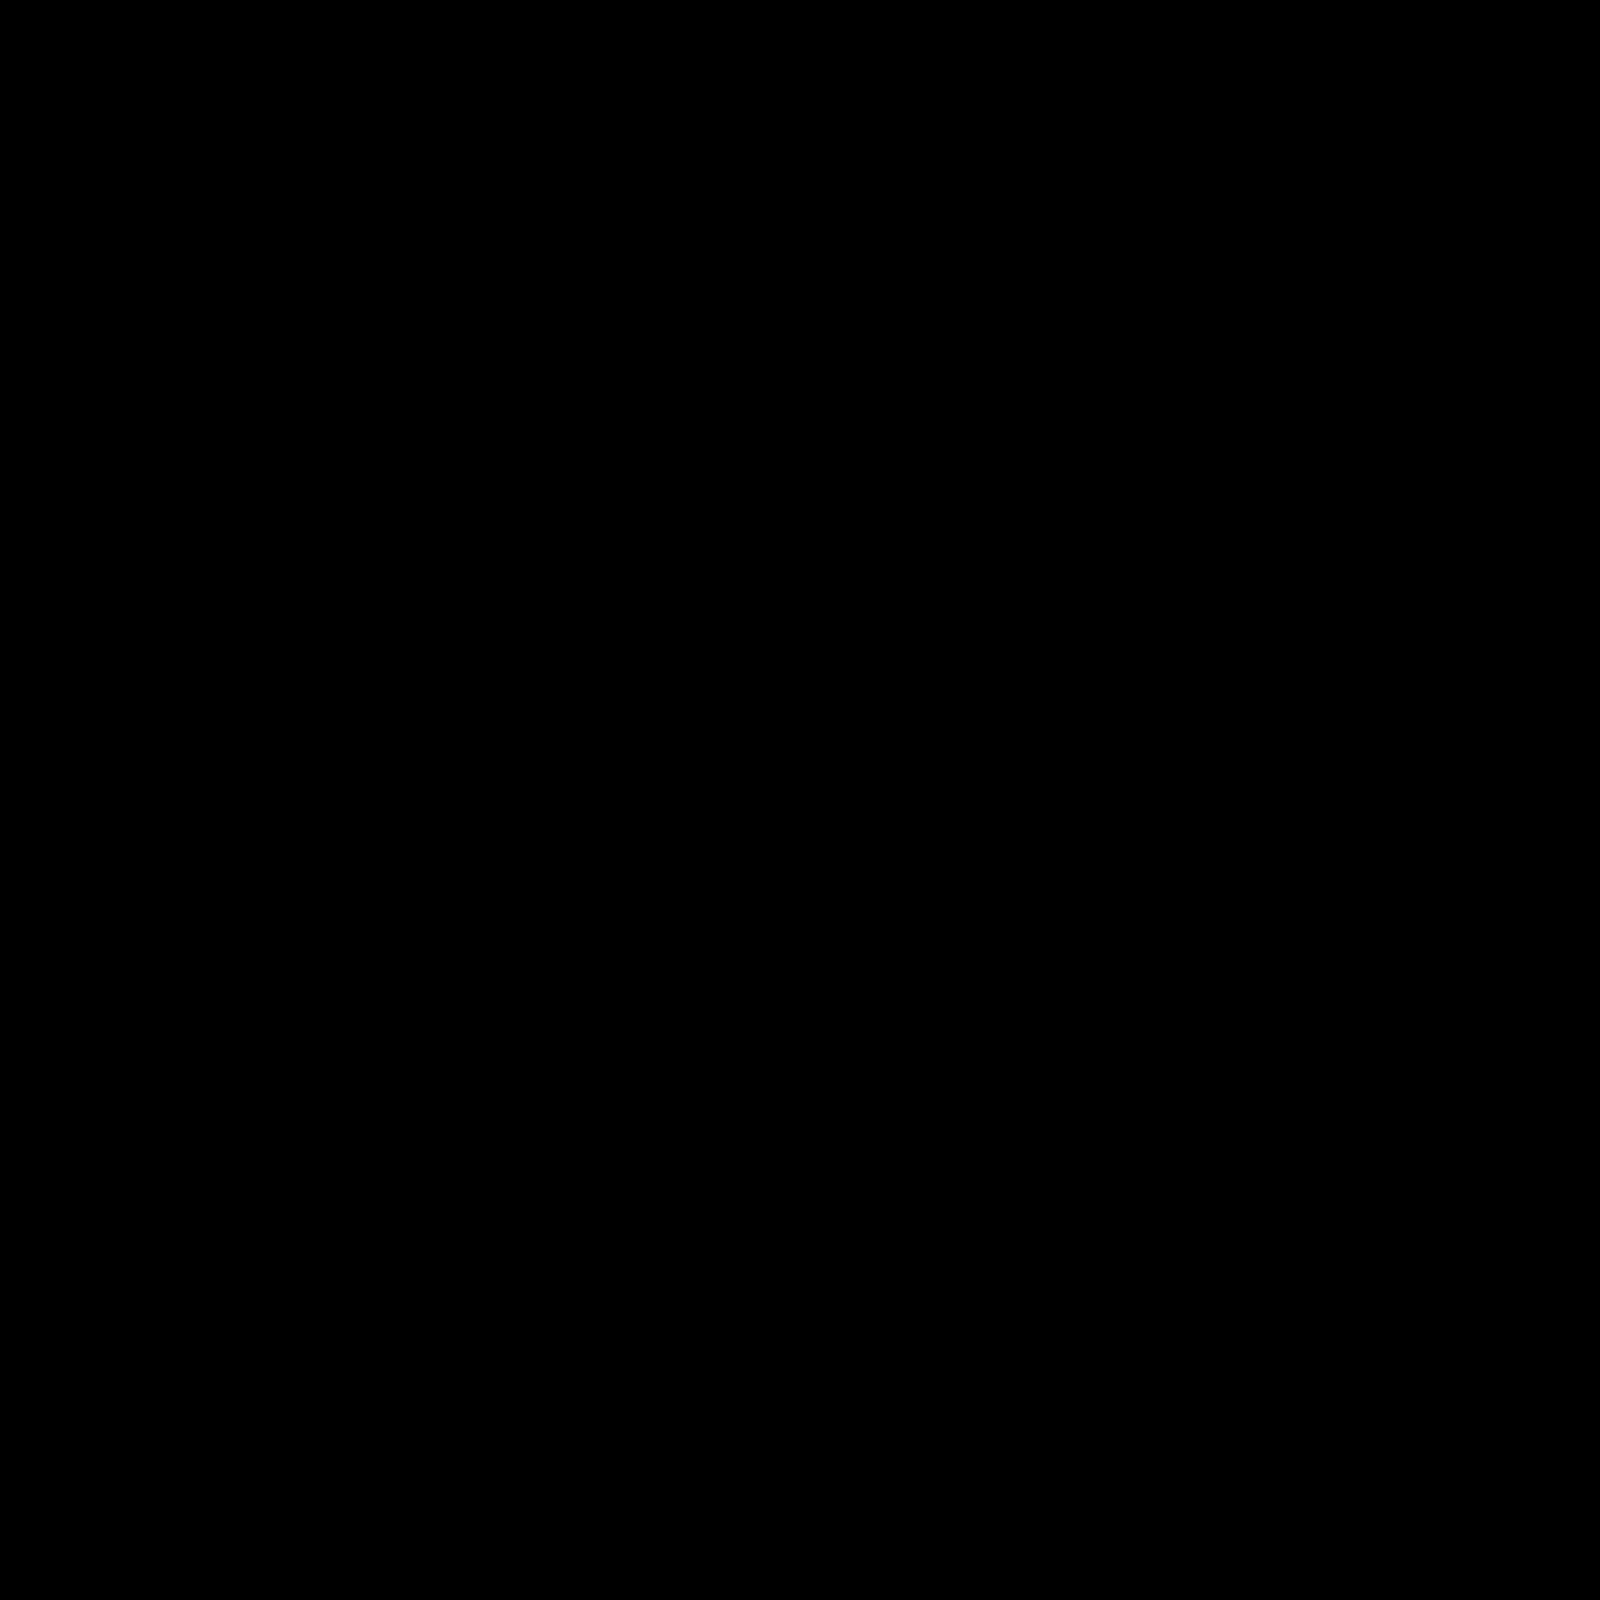 Three Wheel Car icon